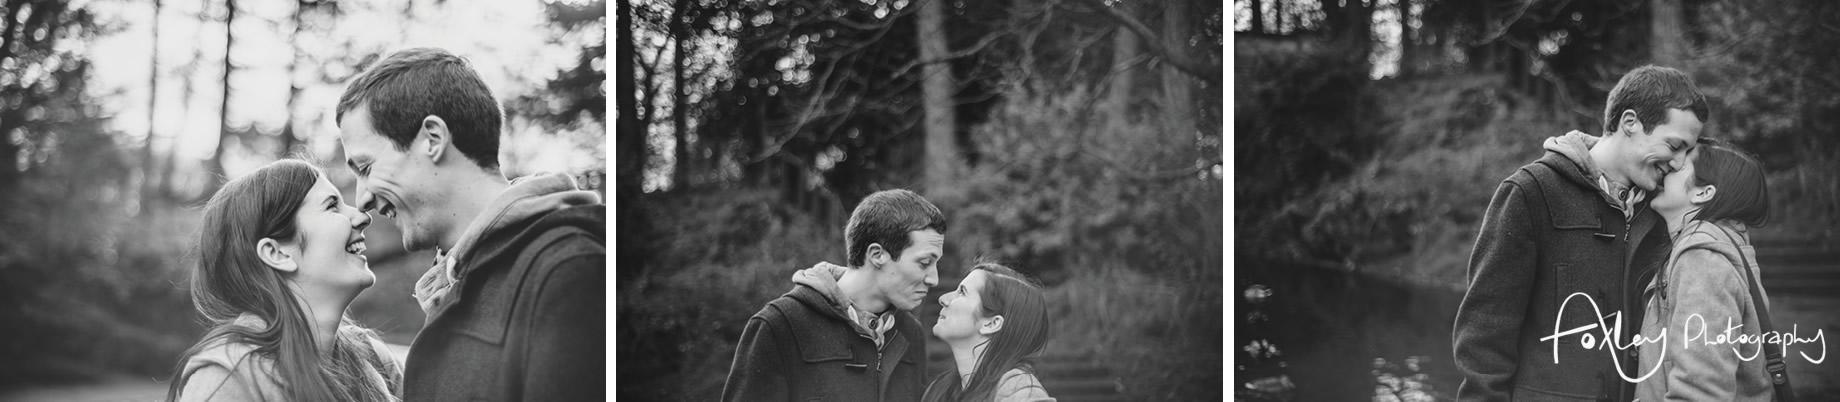 Emma-and-Phil-Pre-Wedding-Shoot-Ashton-Memorial-009